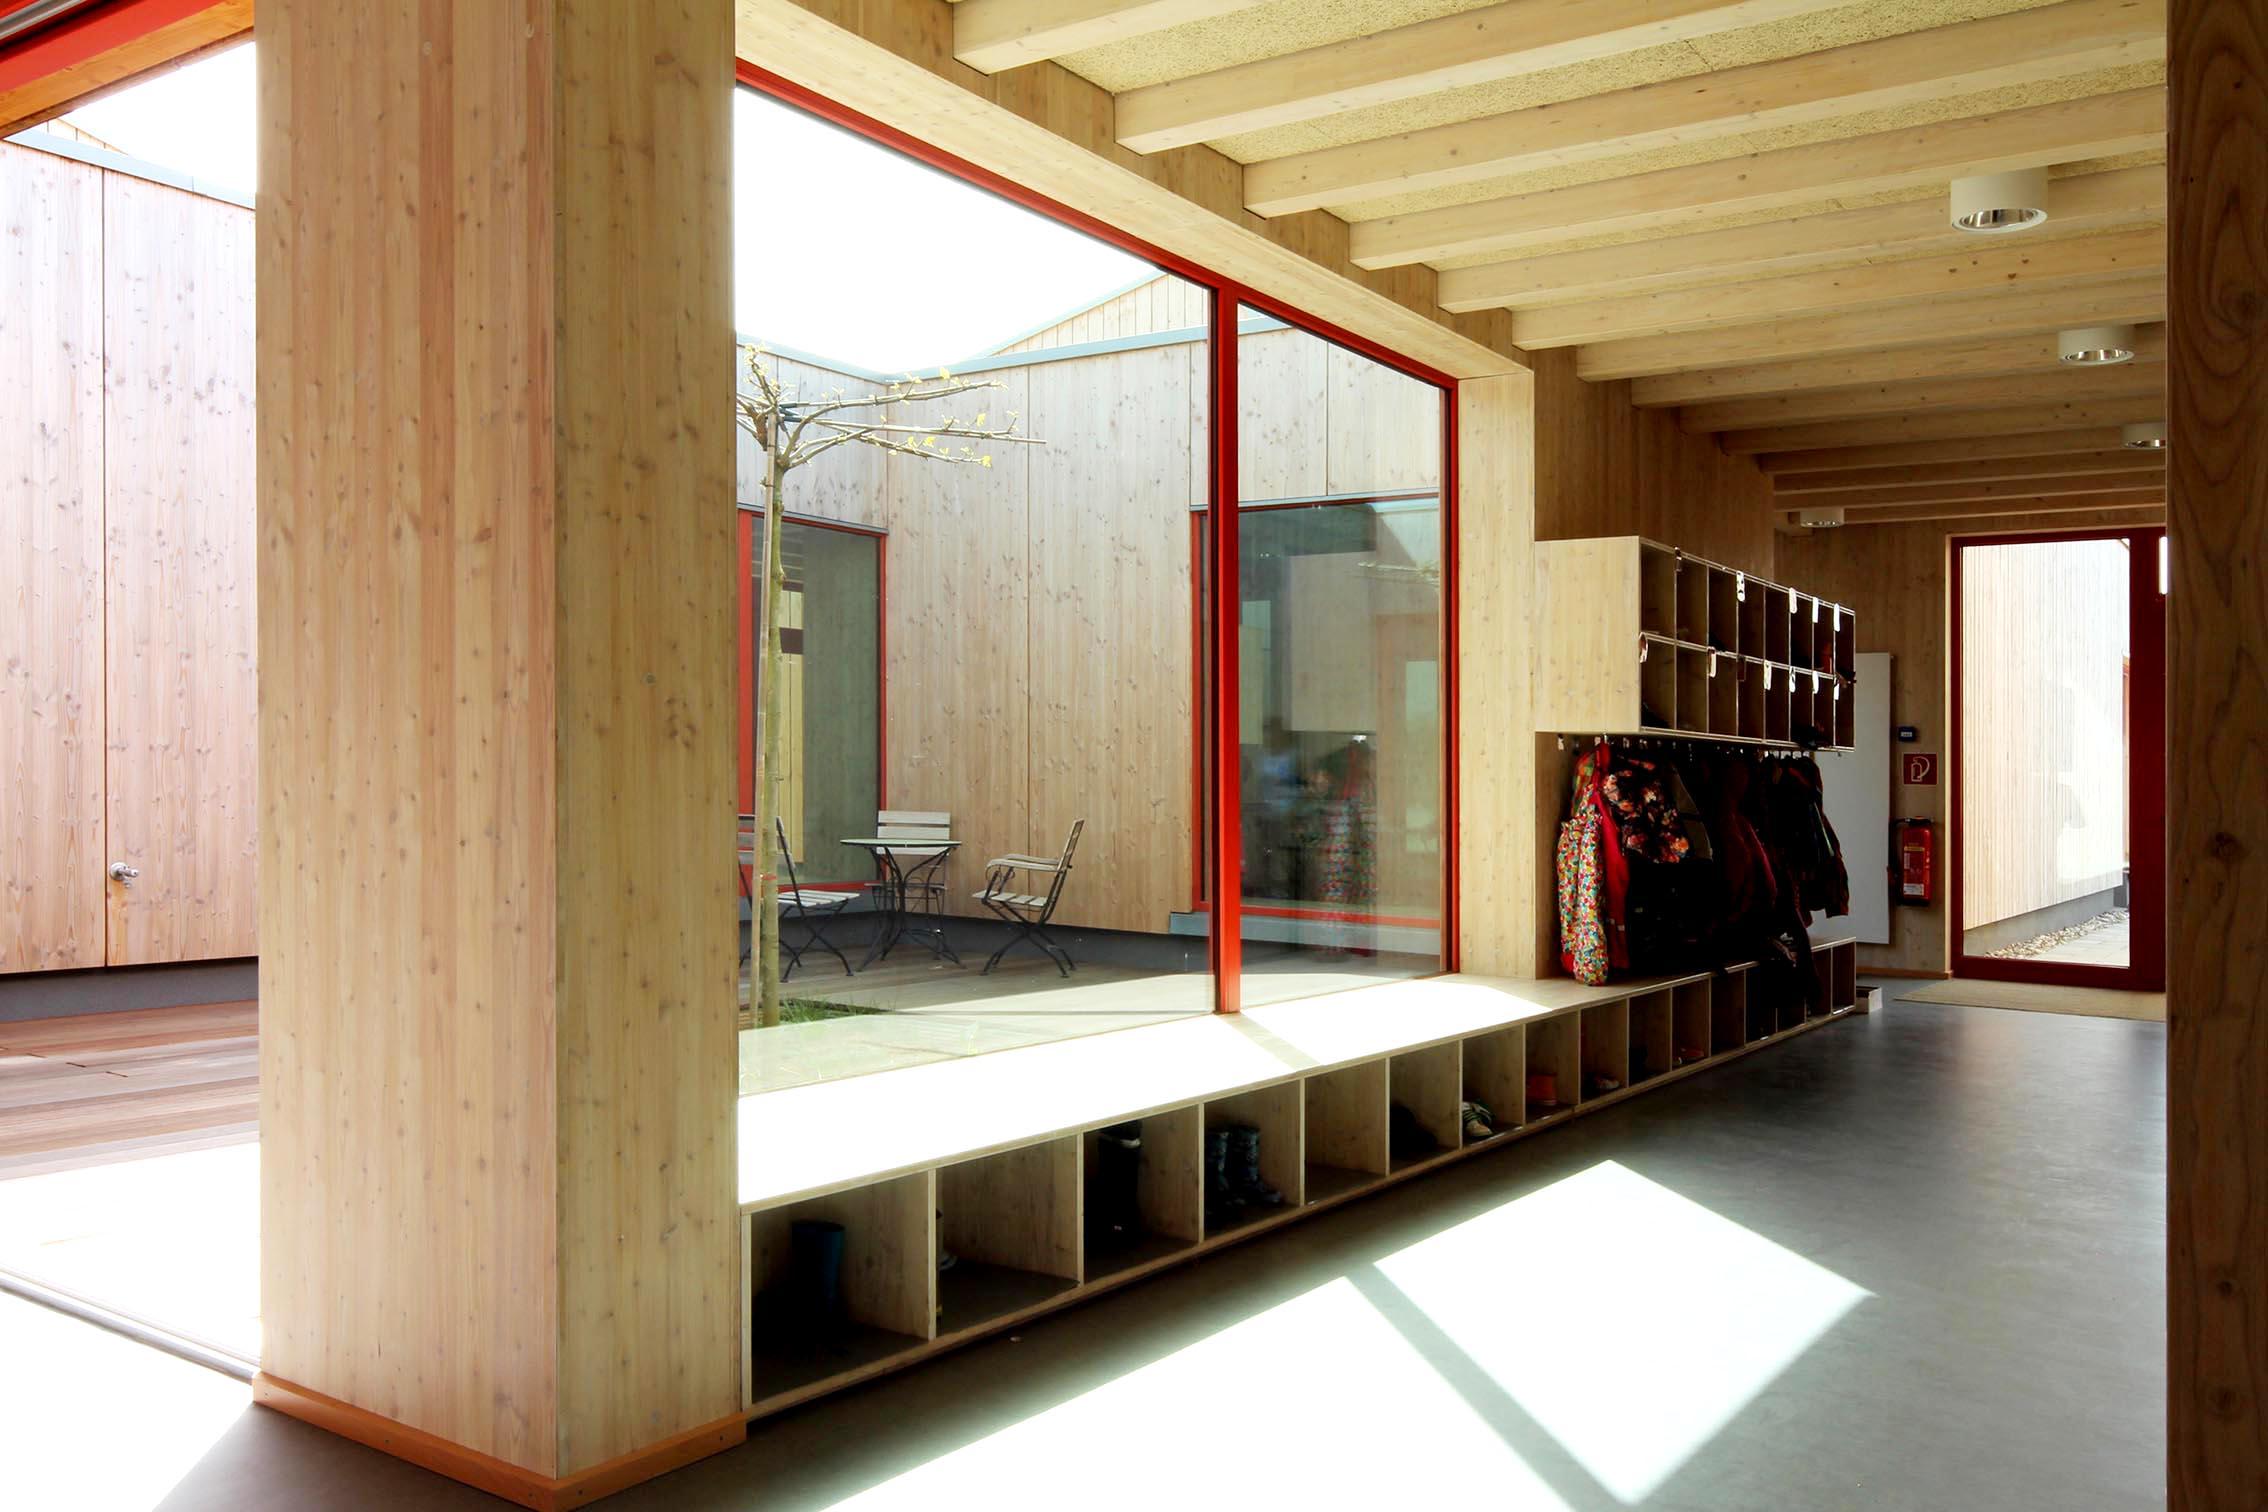 Kinderhaus Heiliegenhaus Tragwerksplanung imagine structure Kindergarten